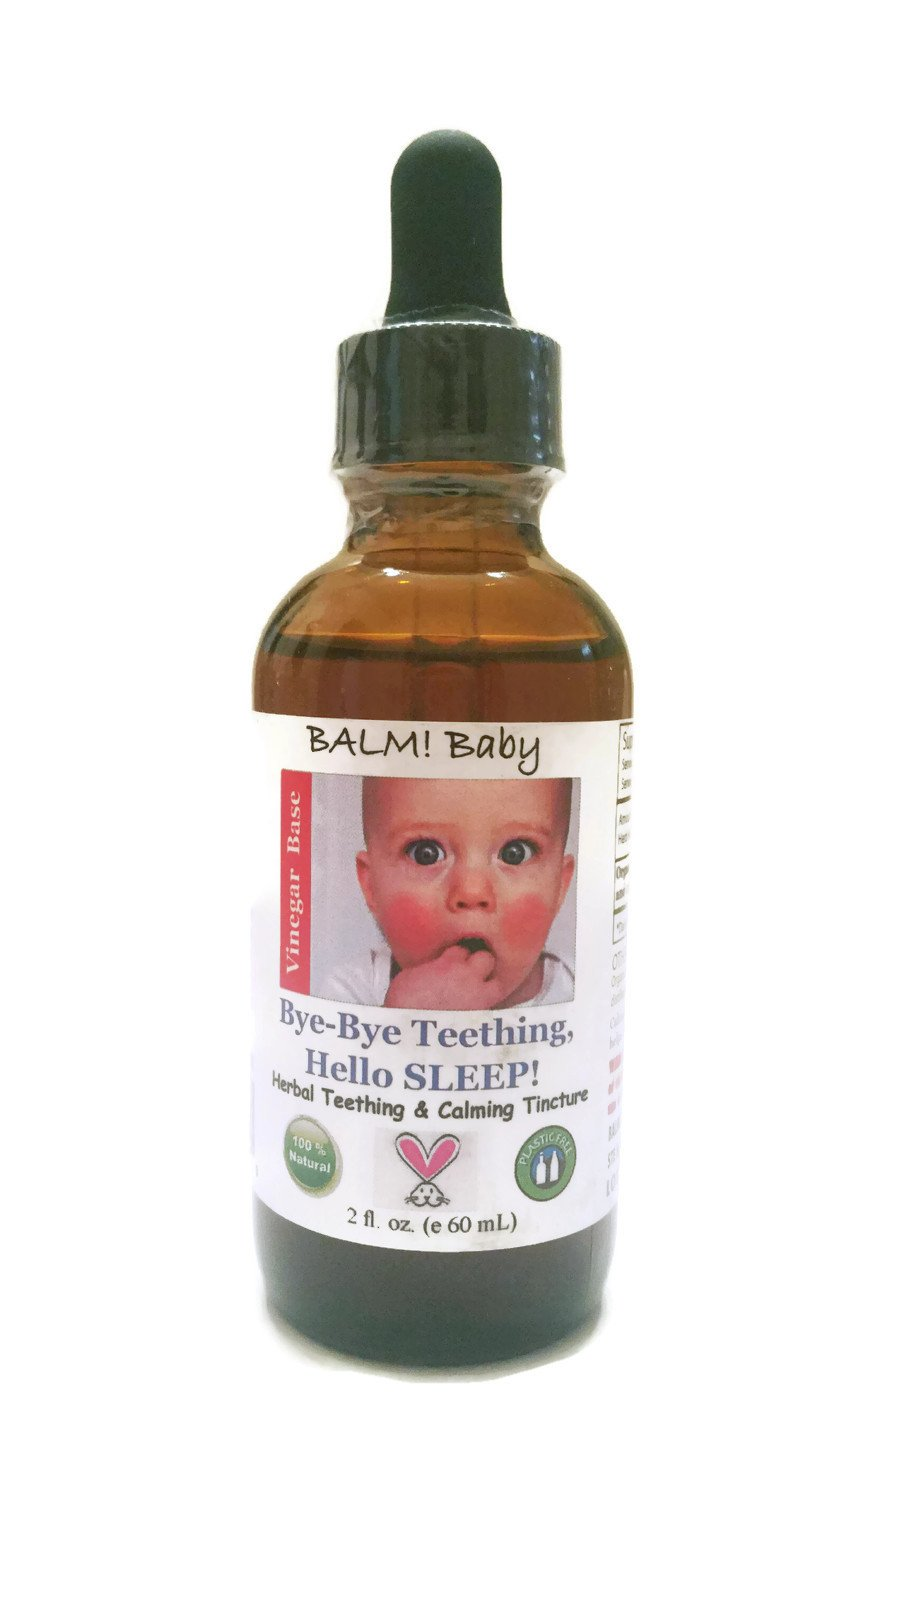 BALM! Baby Bye-Bye Teething Hello SLEEP! Natural Teething Tincture - 2oz (Single, Apple Cider Vinegar)